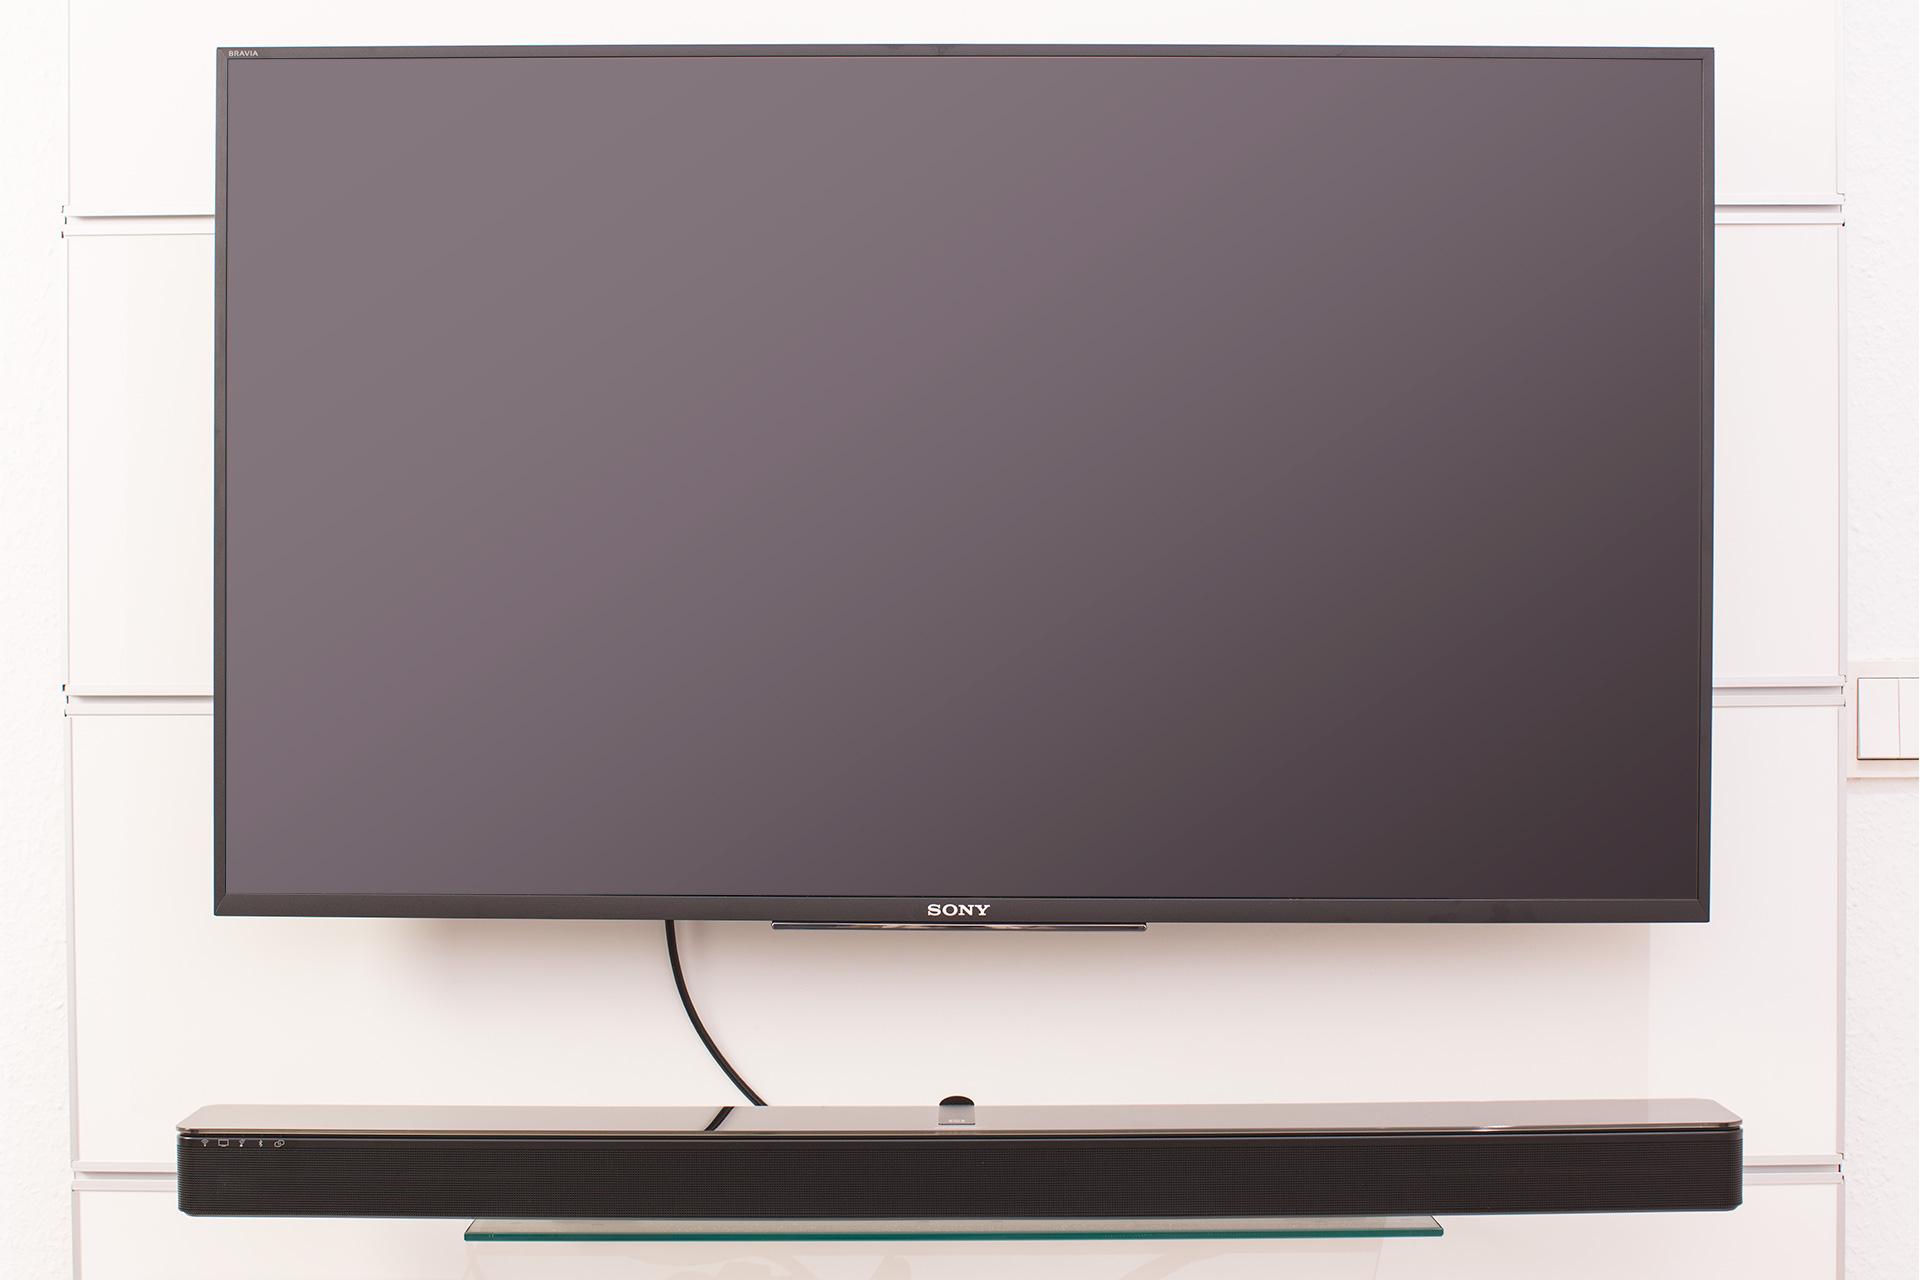 Testbericht Bose Soundtouch 300 Kabellose Soundbar With Acoustimass Plus Virtually Invisible Ein Hdmi Kabel Verbindet Die Mit Dem Tv